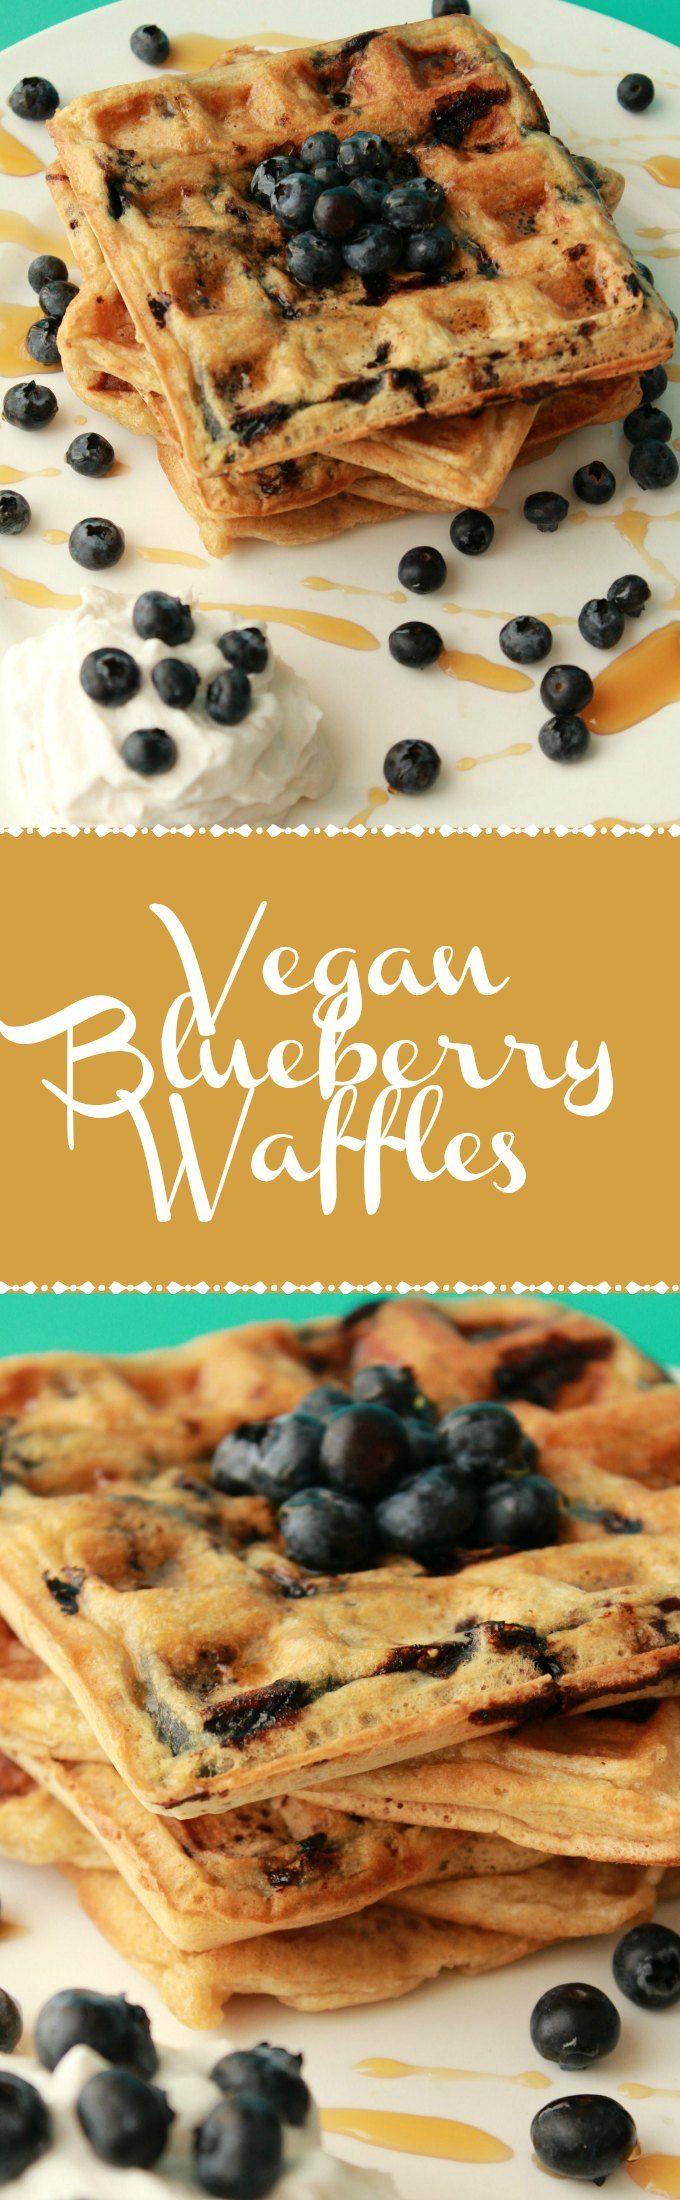 Vegan Blueberry Waffles. Delicious for breakfast with whipped coconut cream, fresh blueberries and maple syrup! Vegan Breakfast | Vegan Waffles | Vegan Recipes | Vegan Dessert | Vegan Food